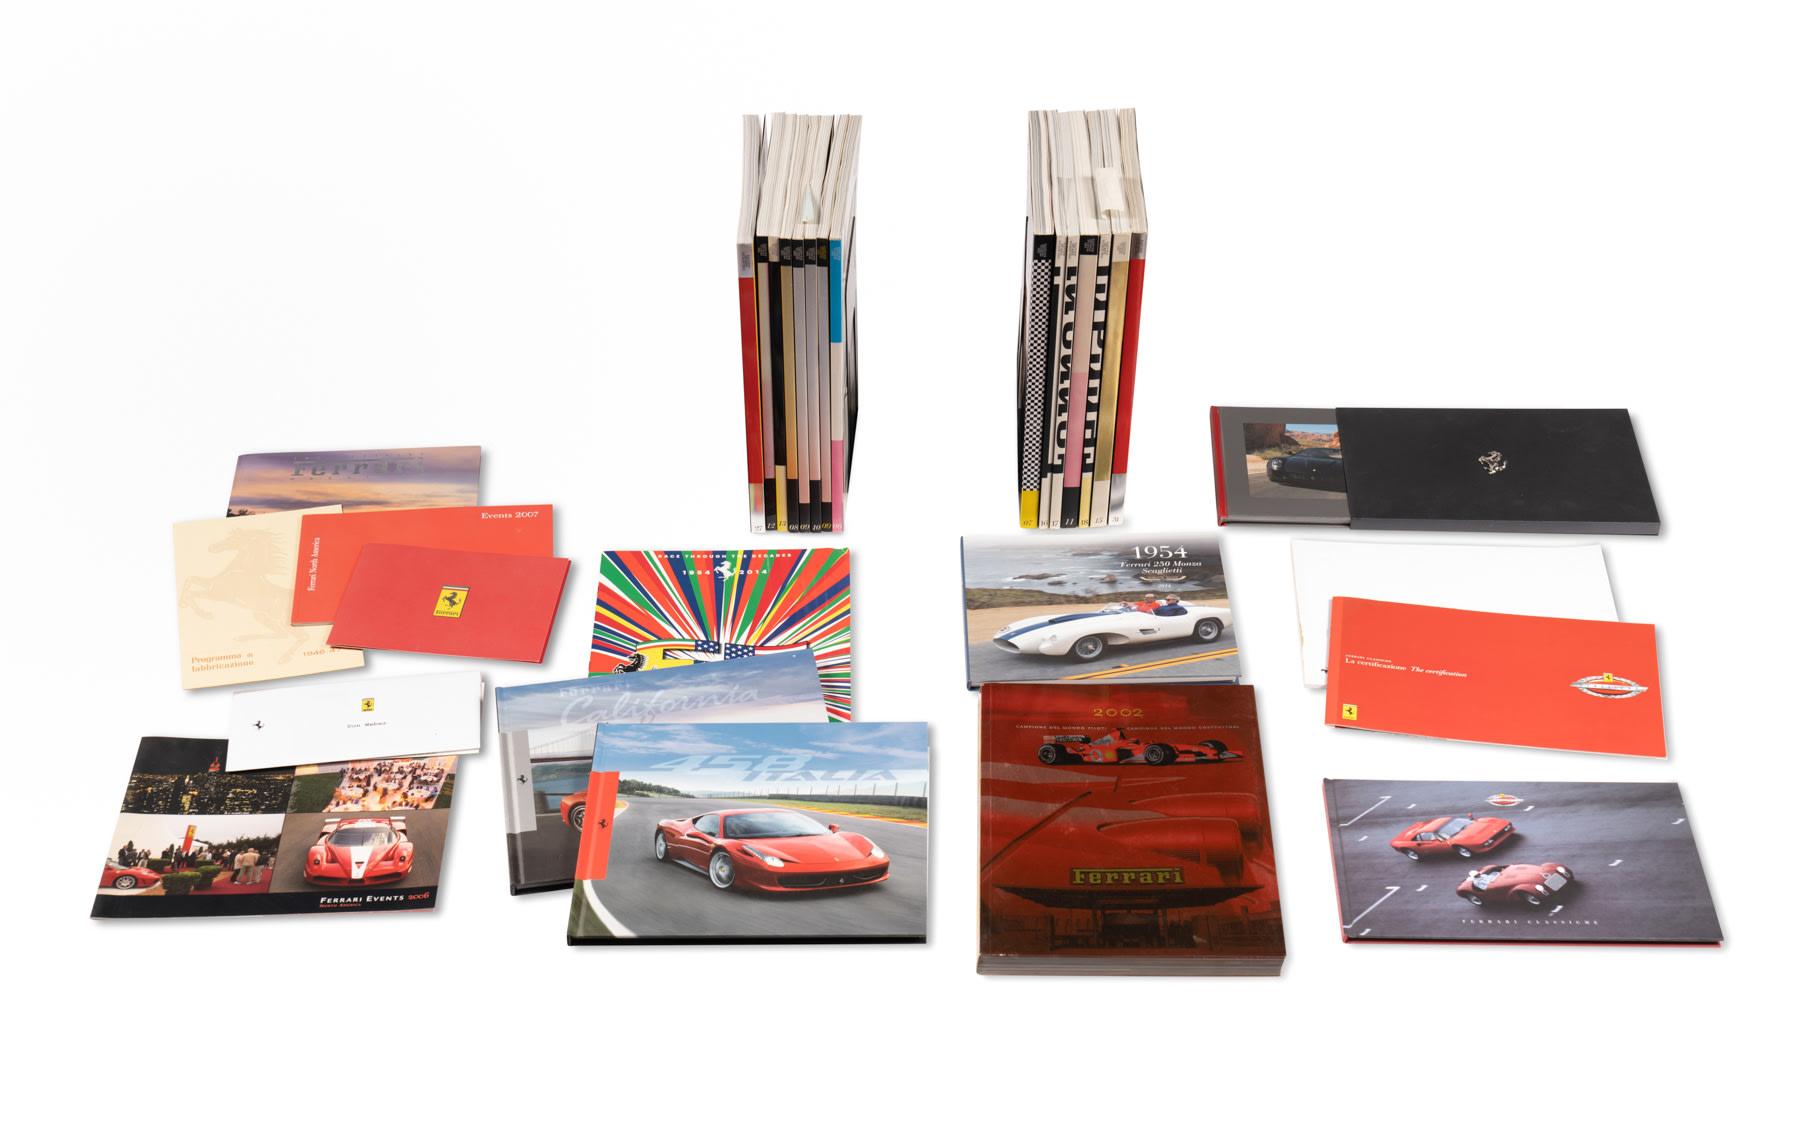 Assorted Ferrari Literature and Official Ferrari Magazines, 2000-Present